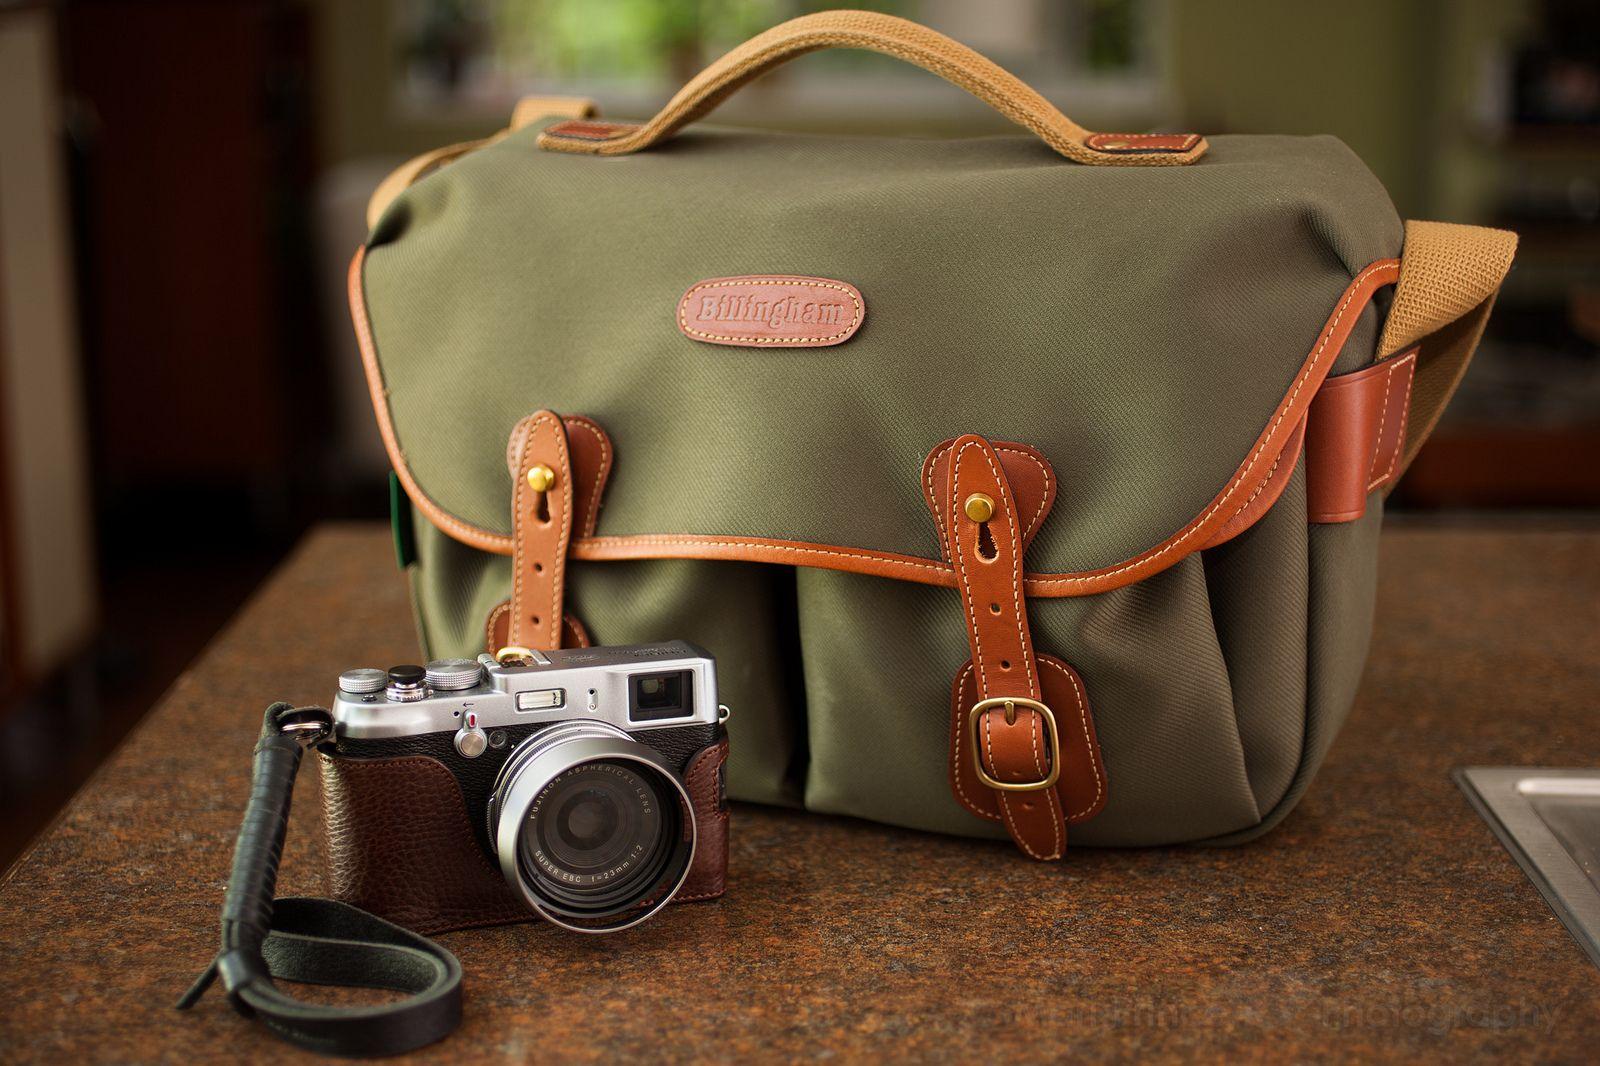 All Sizes Fuji X100 With Billingham Hadley Pro Bag Flickr Shoulder Small Sage Choc Leather Trim Photo Sharing